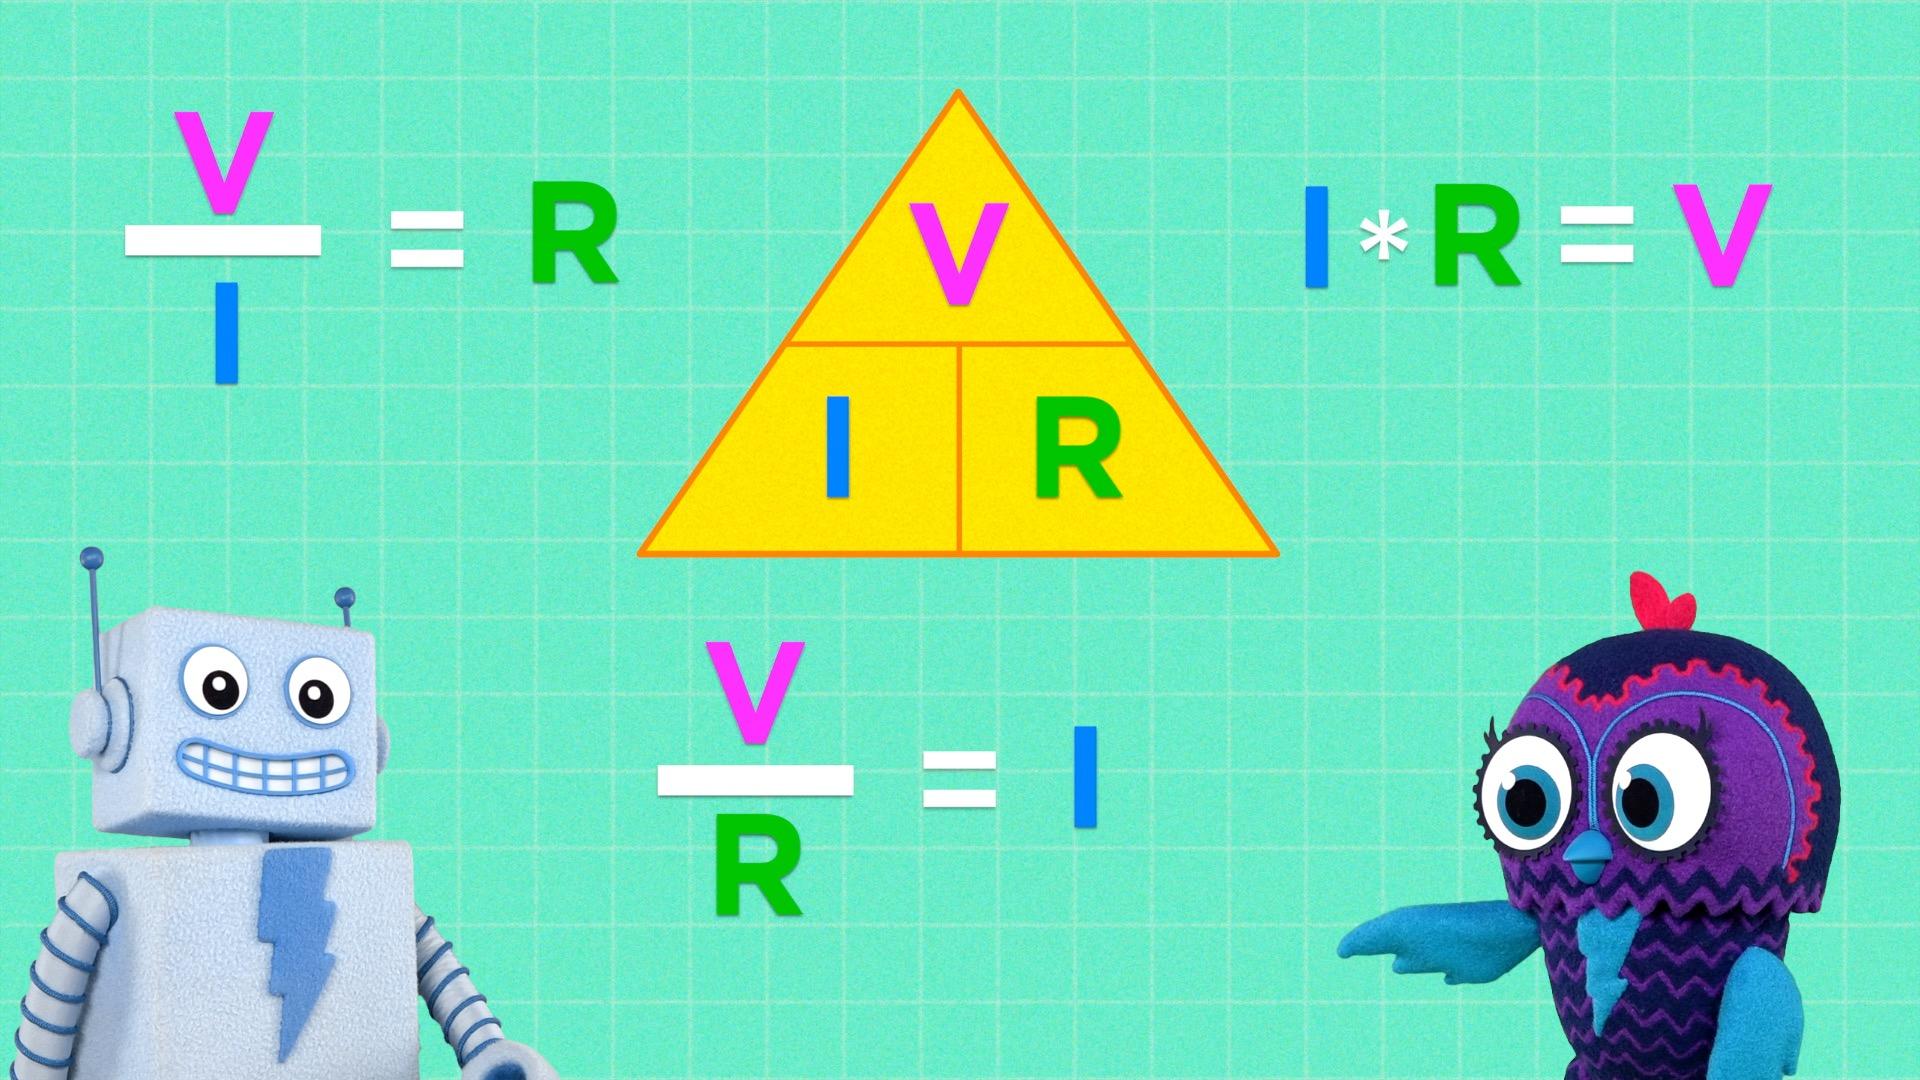 circuit_playground_Circuit_Playground_-_O_is_for_Ohm_p15.jpg